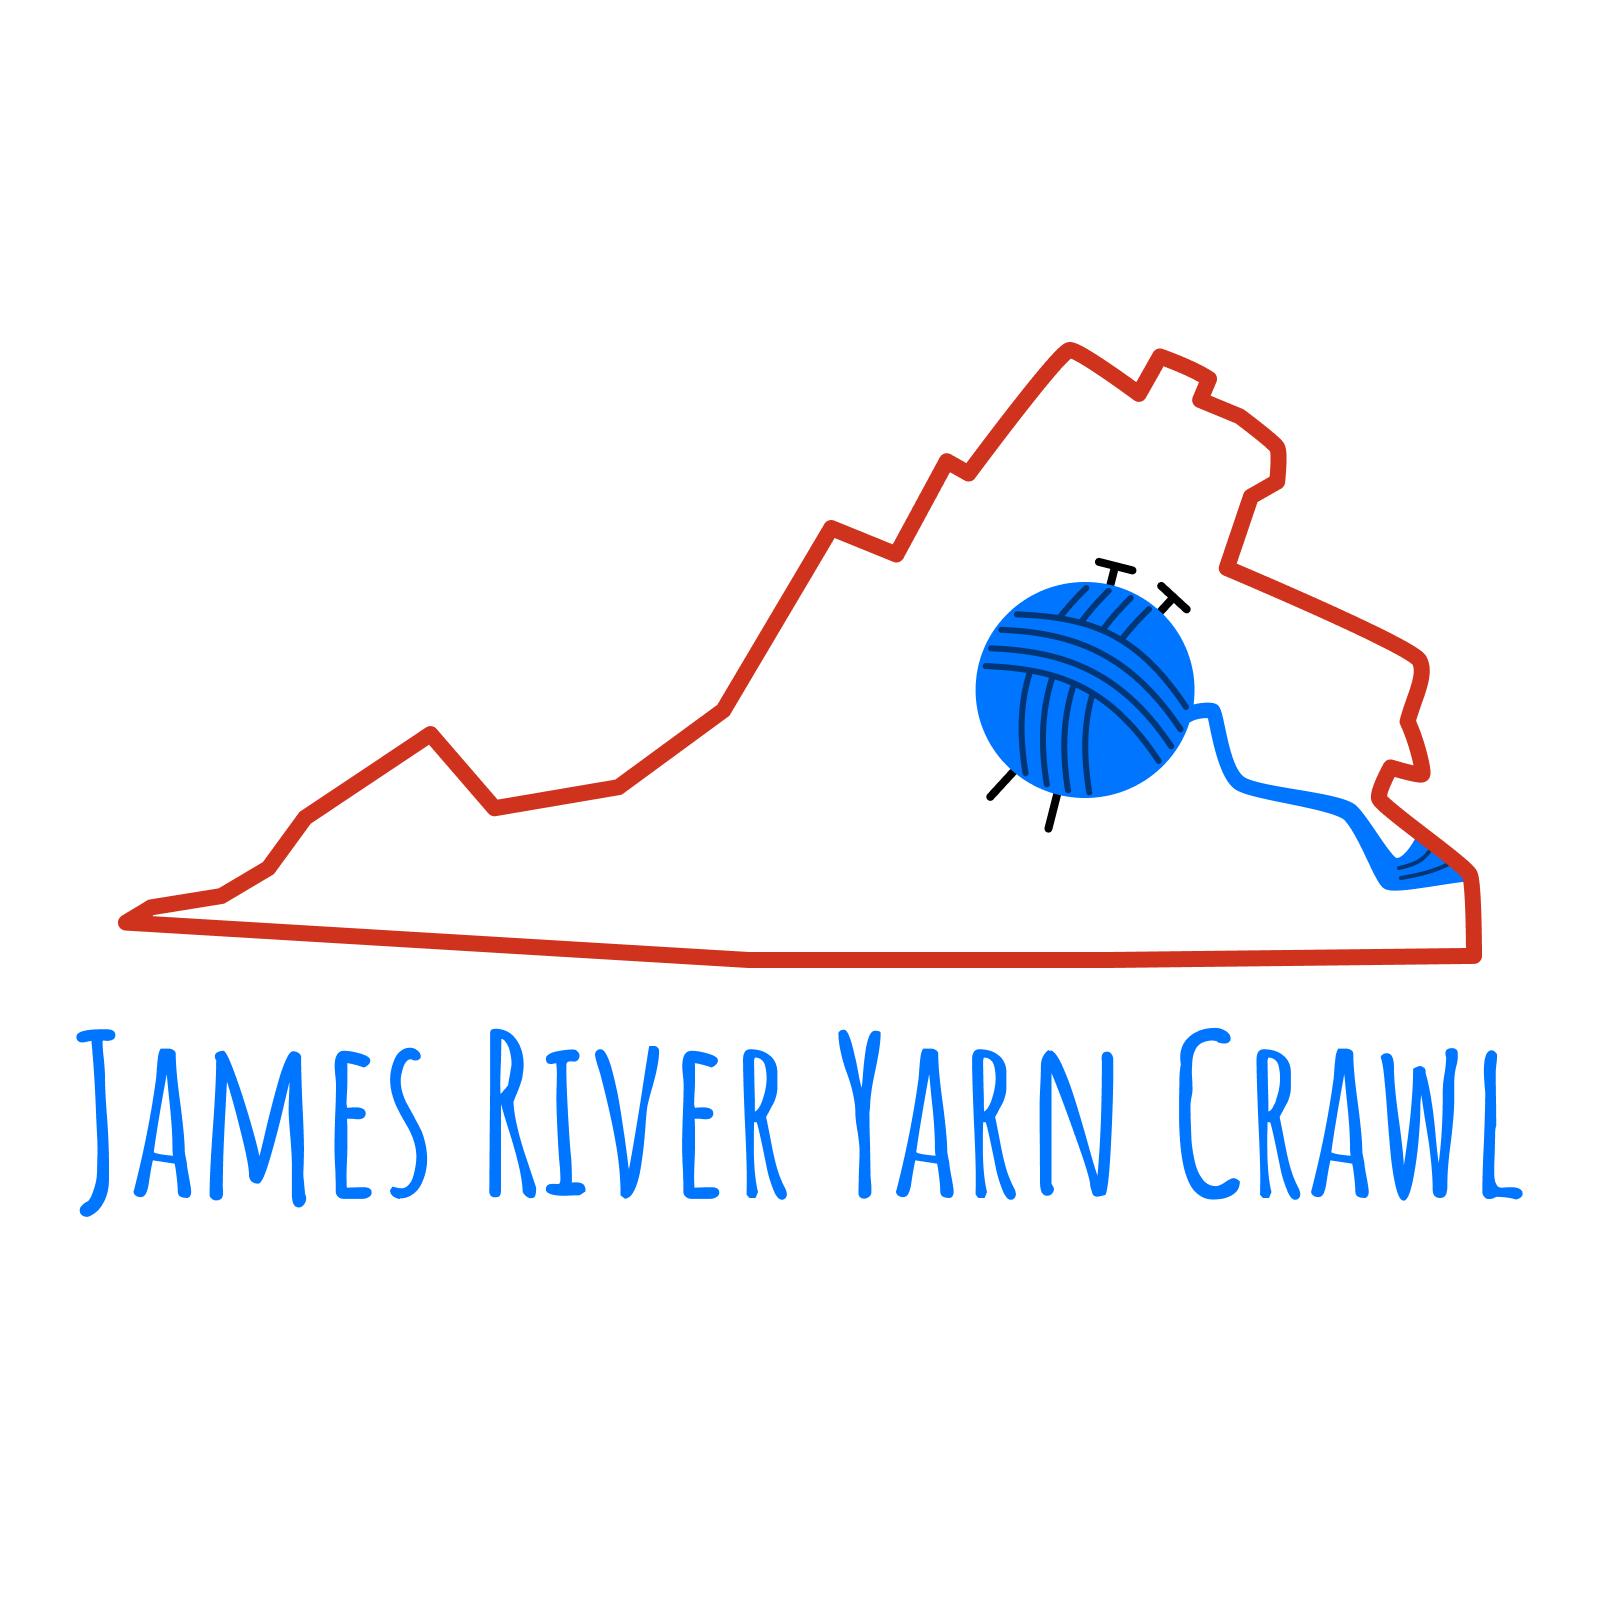 james river yarn crawl